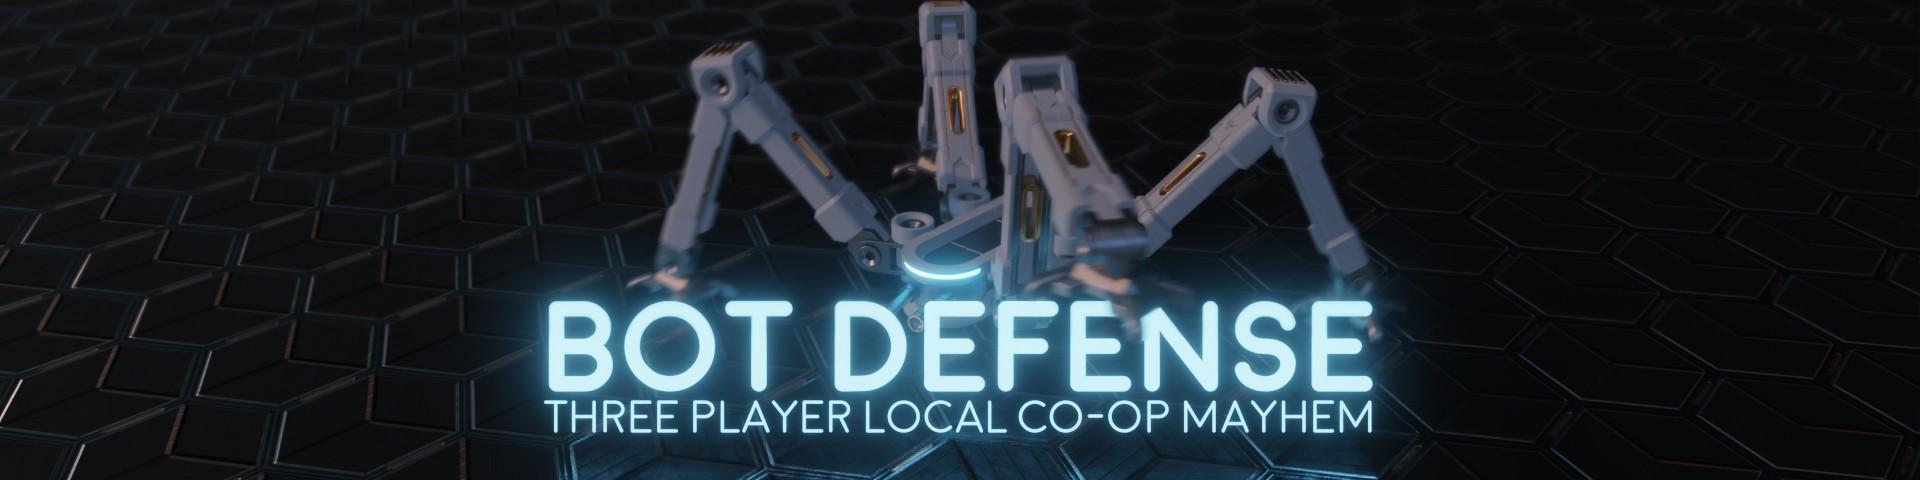 Bot Defense - Three Player Local Co-Op Mayhem